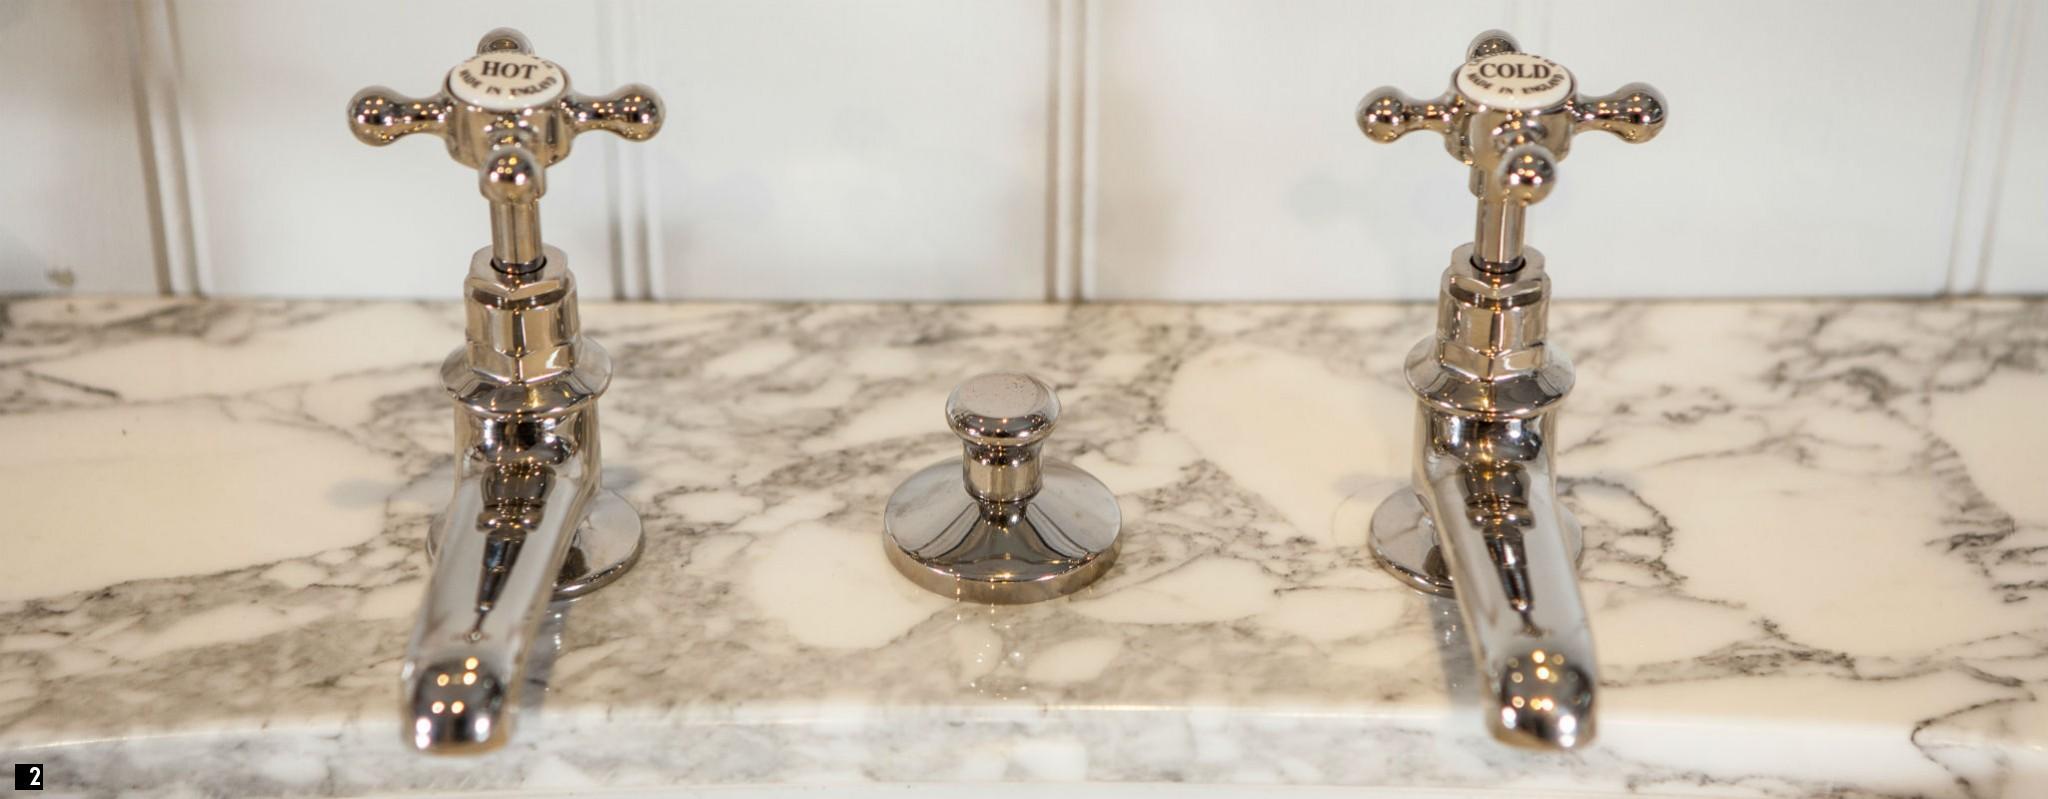 Chadder Nickel Vintage luxury Taps and Fittings Victorian Luxury Bathrooms